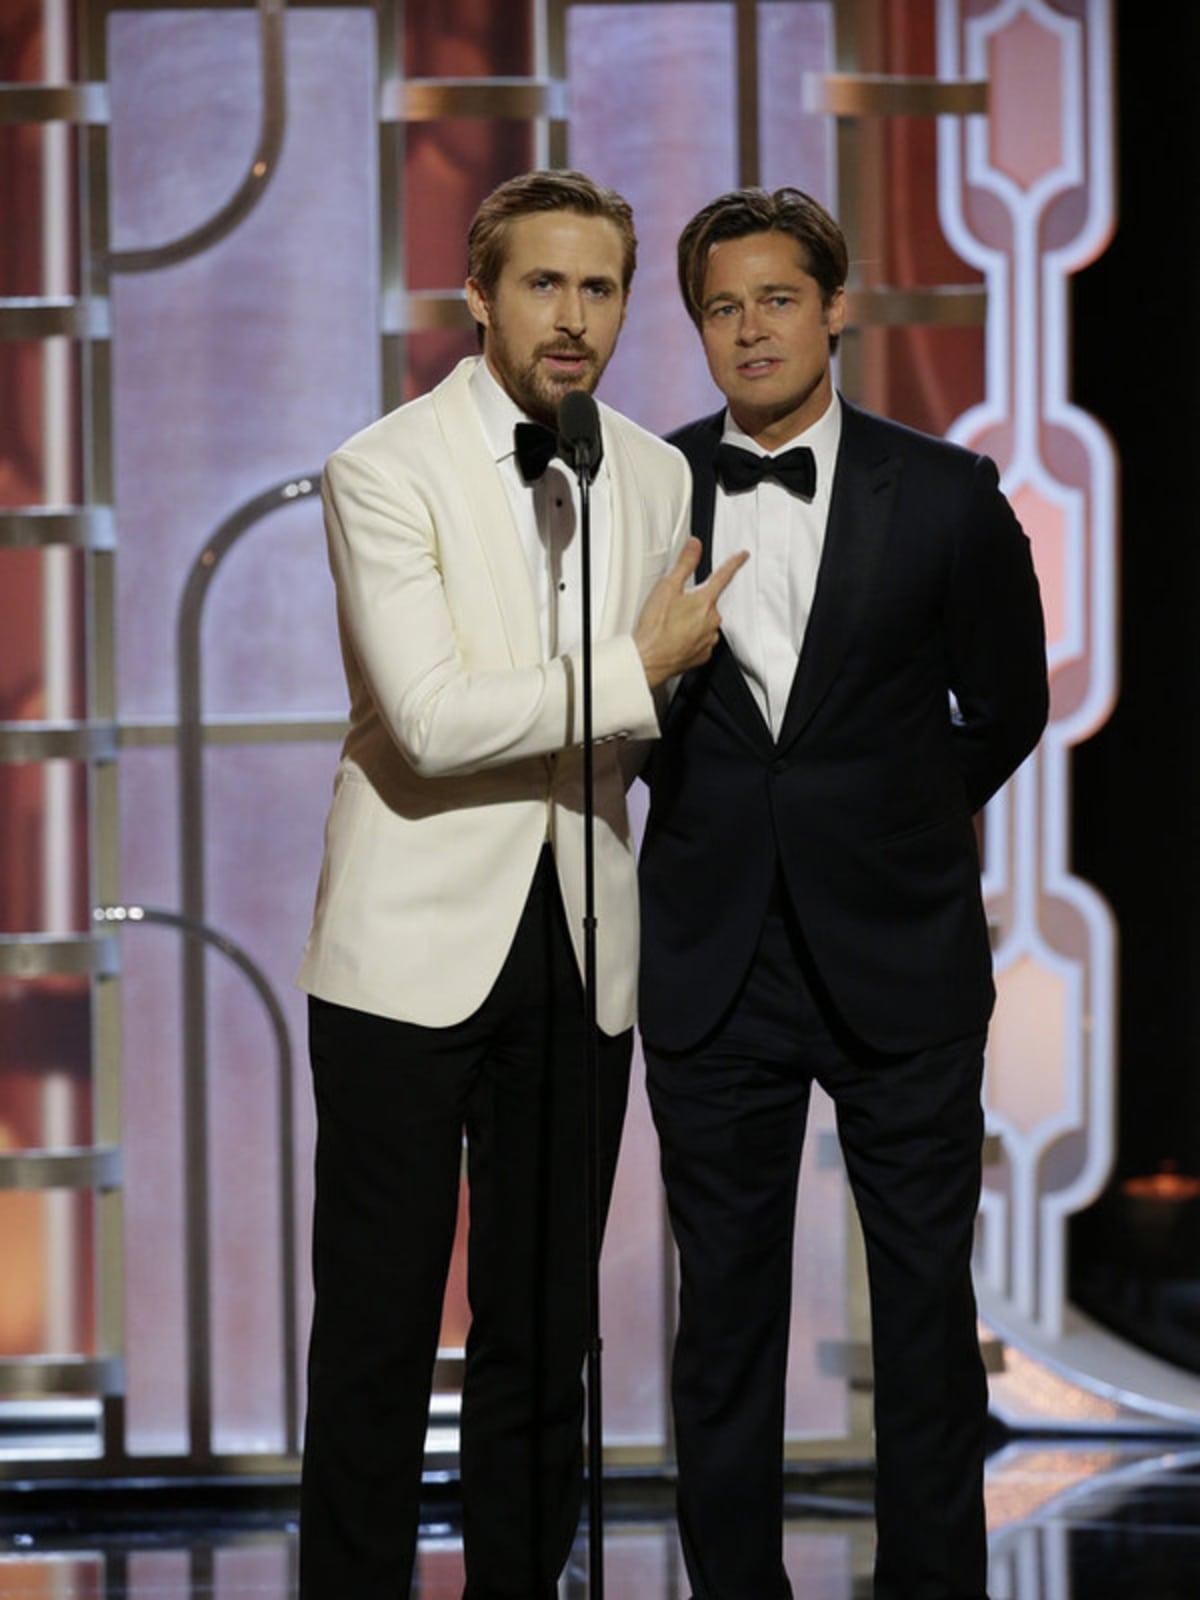 Ryan Gosling and Brad Pitt at Golden Globe Awards